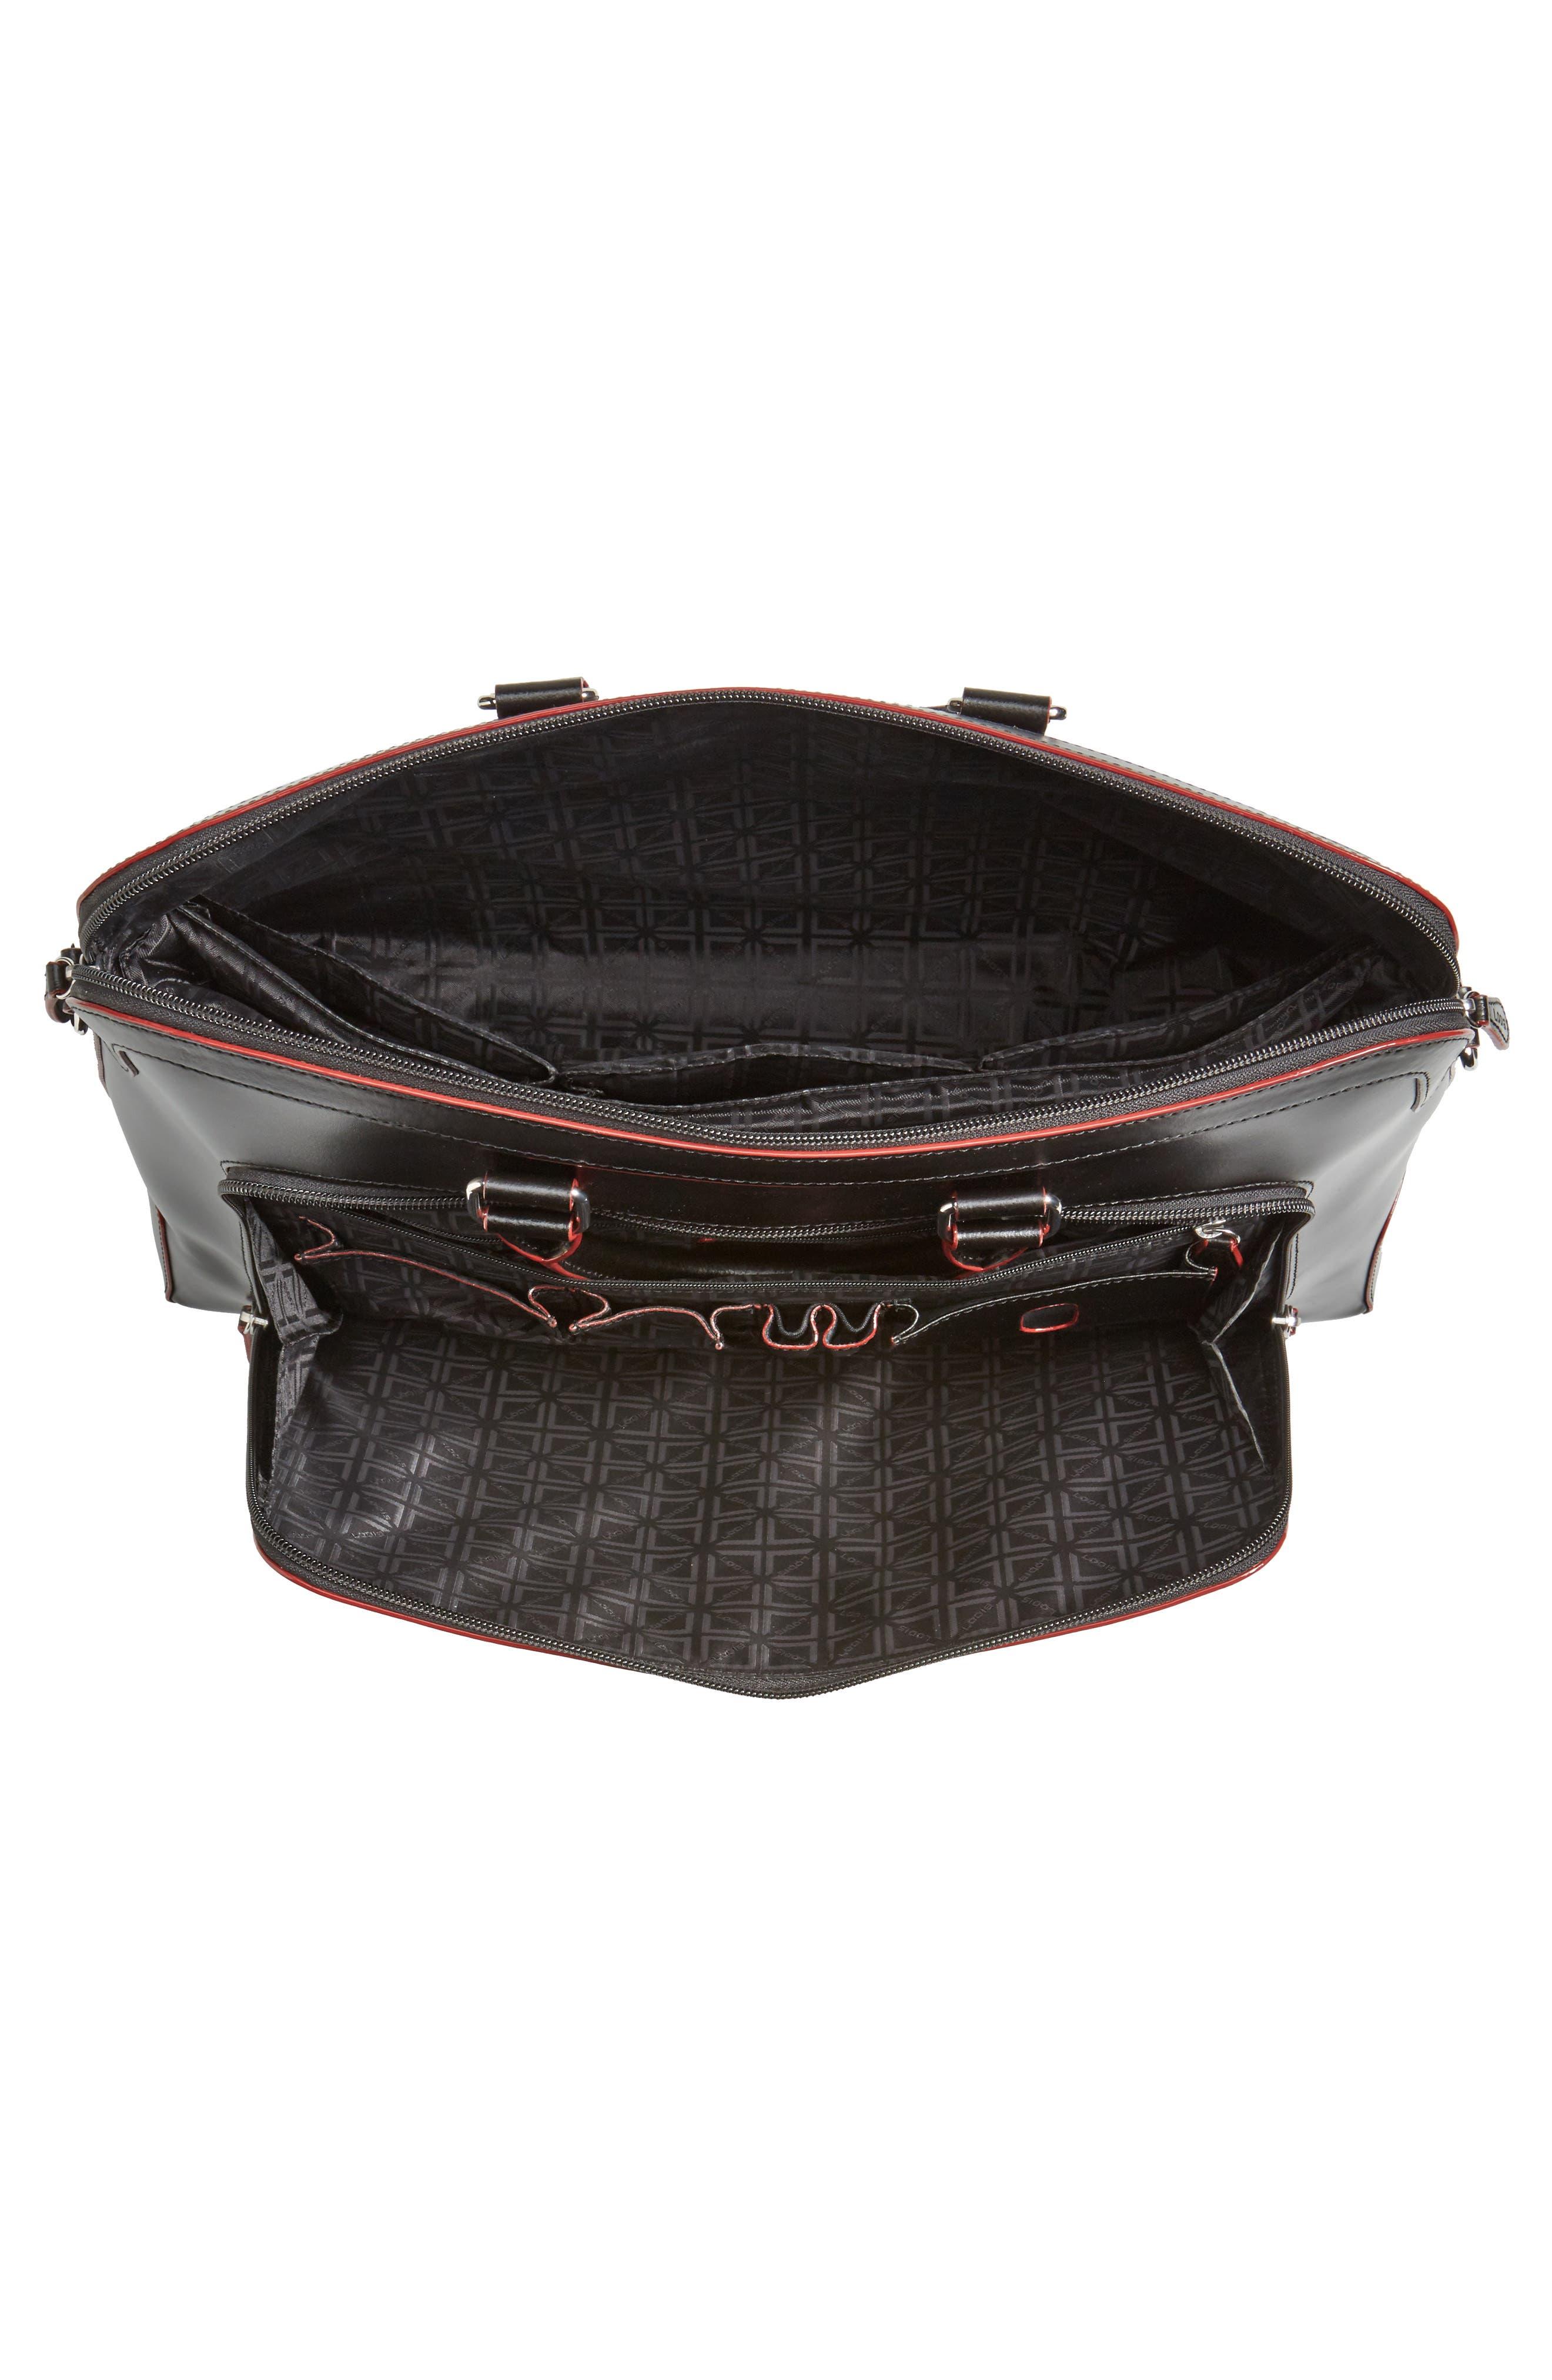 Audrey Under Lock & Key - Brera RFID Leather Briefcase,                             Alternate thumbnail 3, color,                             Black